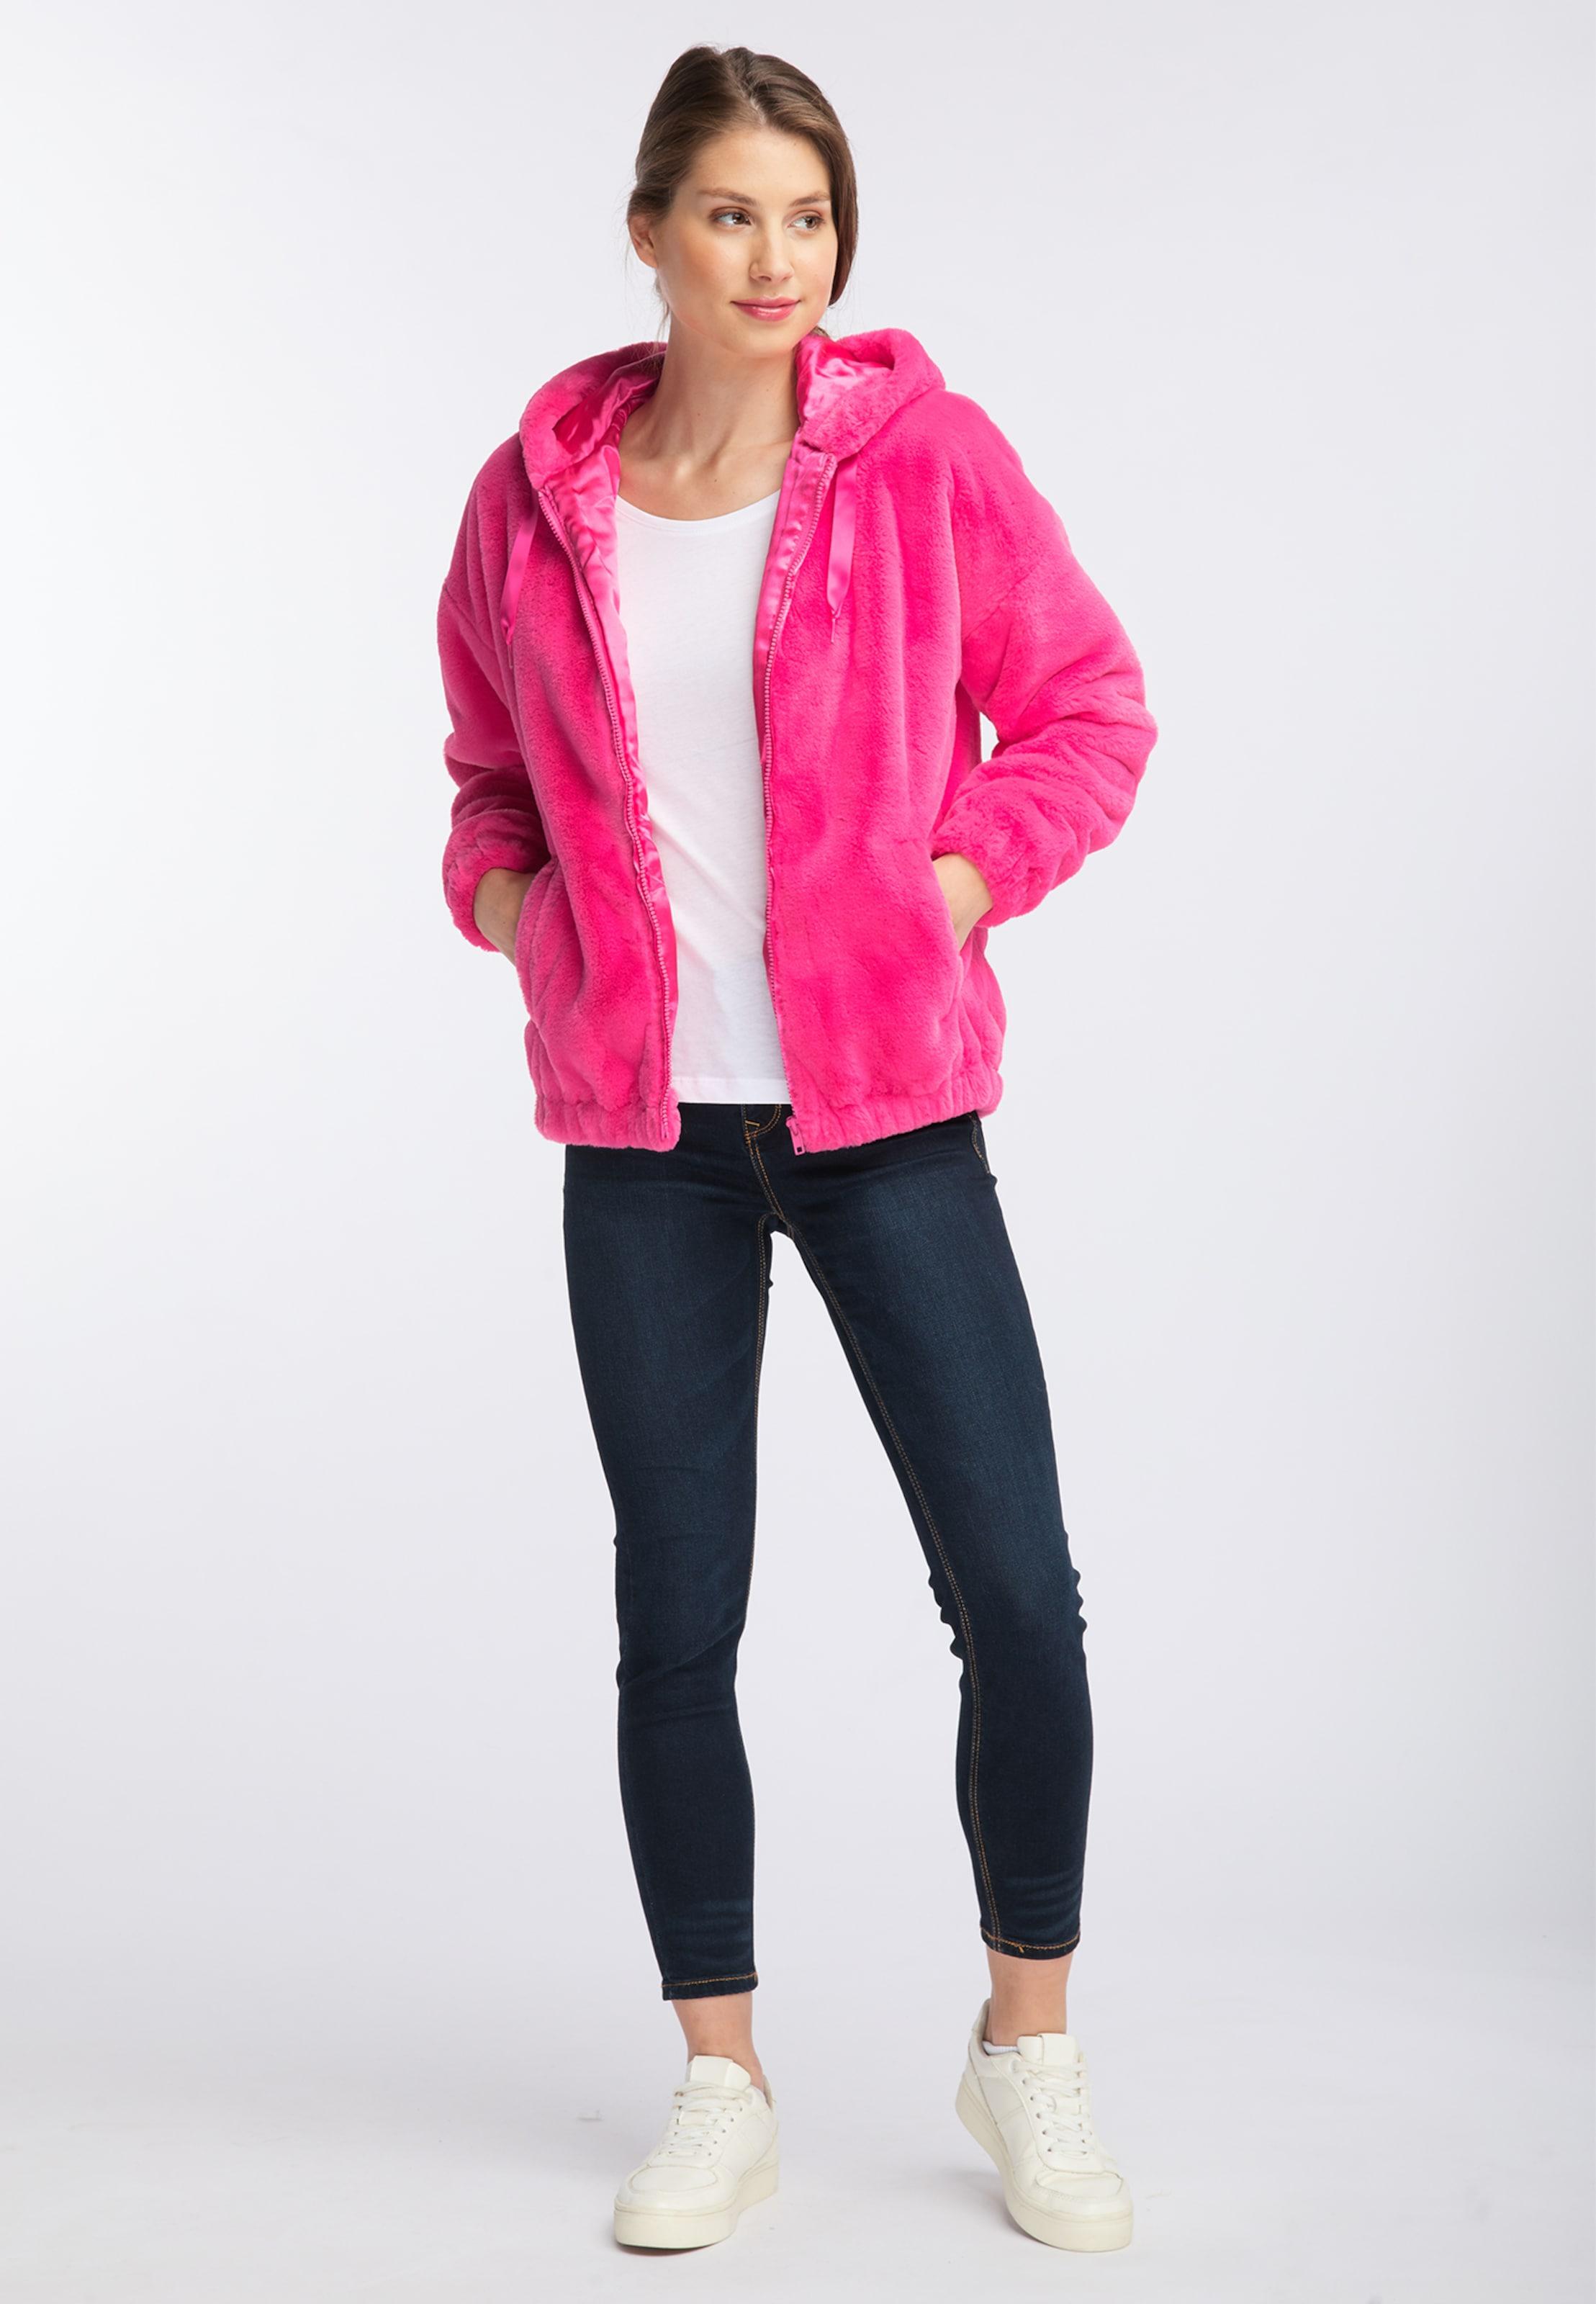 In Pink Jacke Taddy Jacke Taddy Jacke Taddy In Jacke In Pink Taddy In Pink 7yvbfgY6